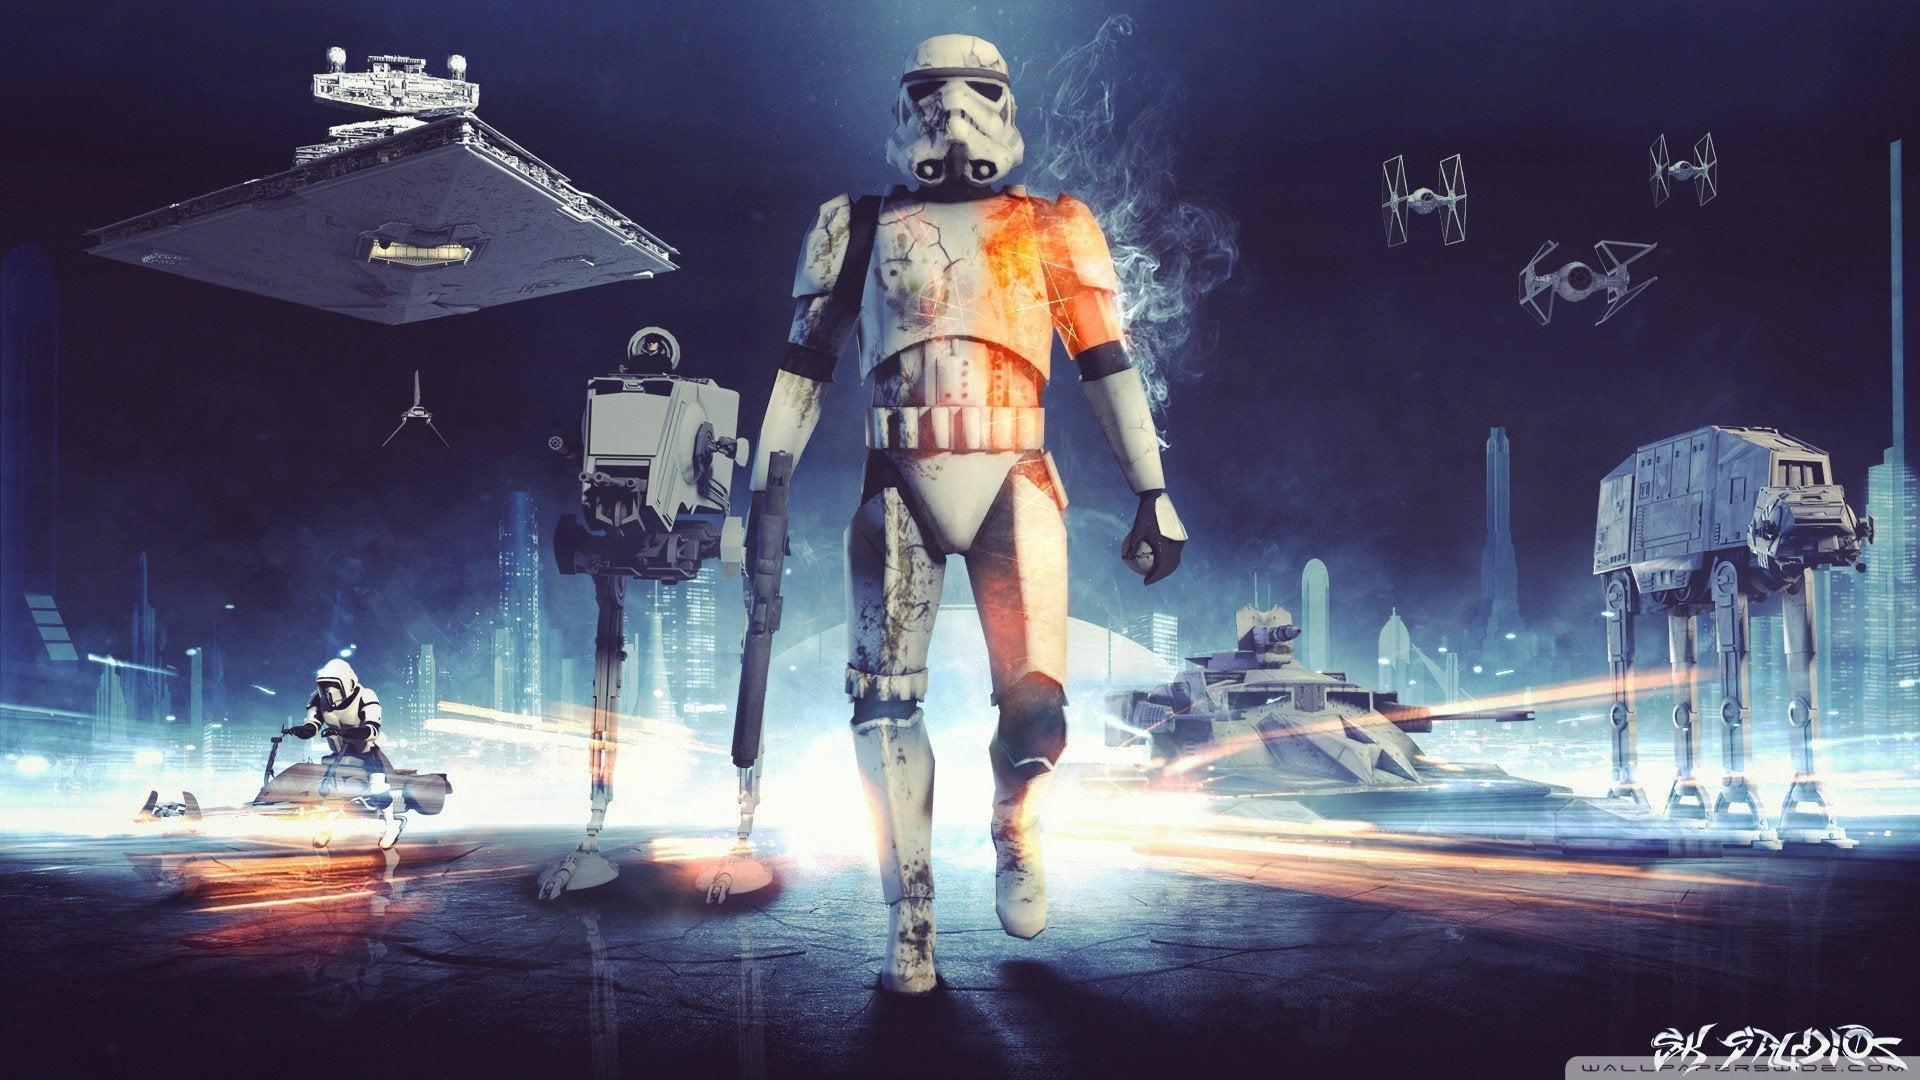 Star Wars Battlefront Ii Wallpapers Posted By Ryan Peltier